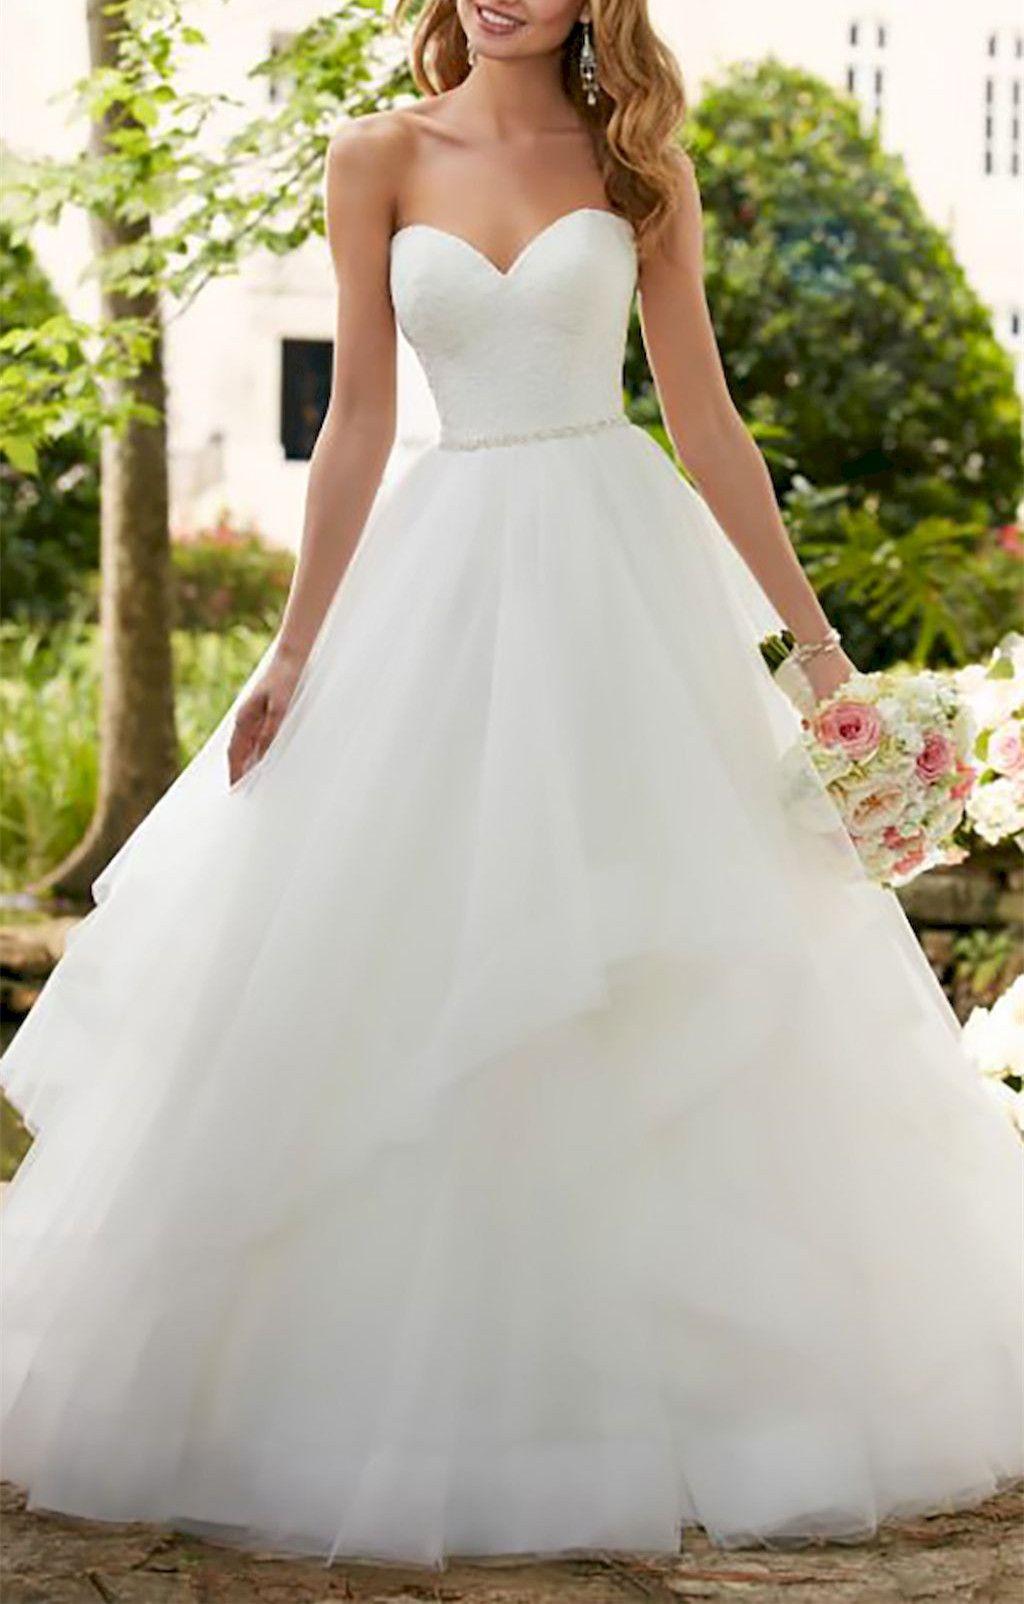 Pearl belt for wedding dress  Romantic White Lace Wedding DressSweetheart Tulle Bridal Dress